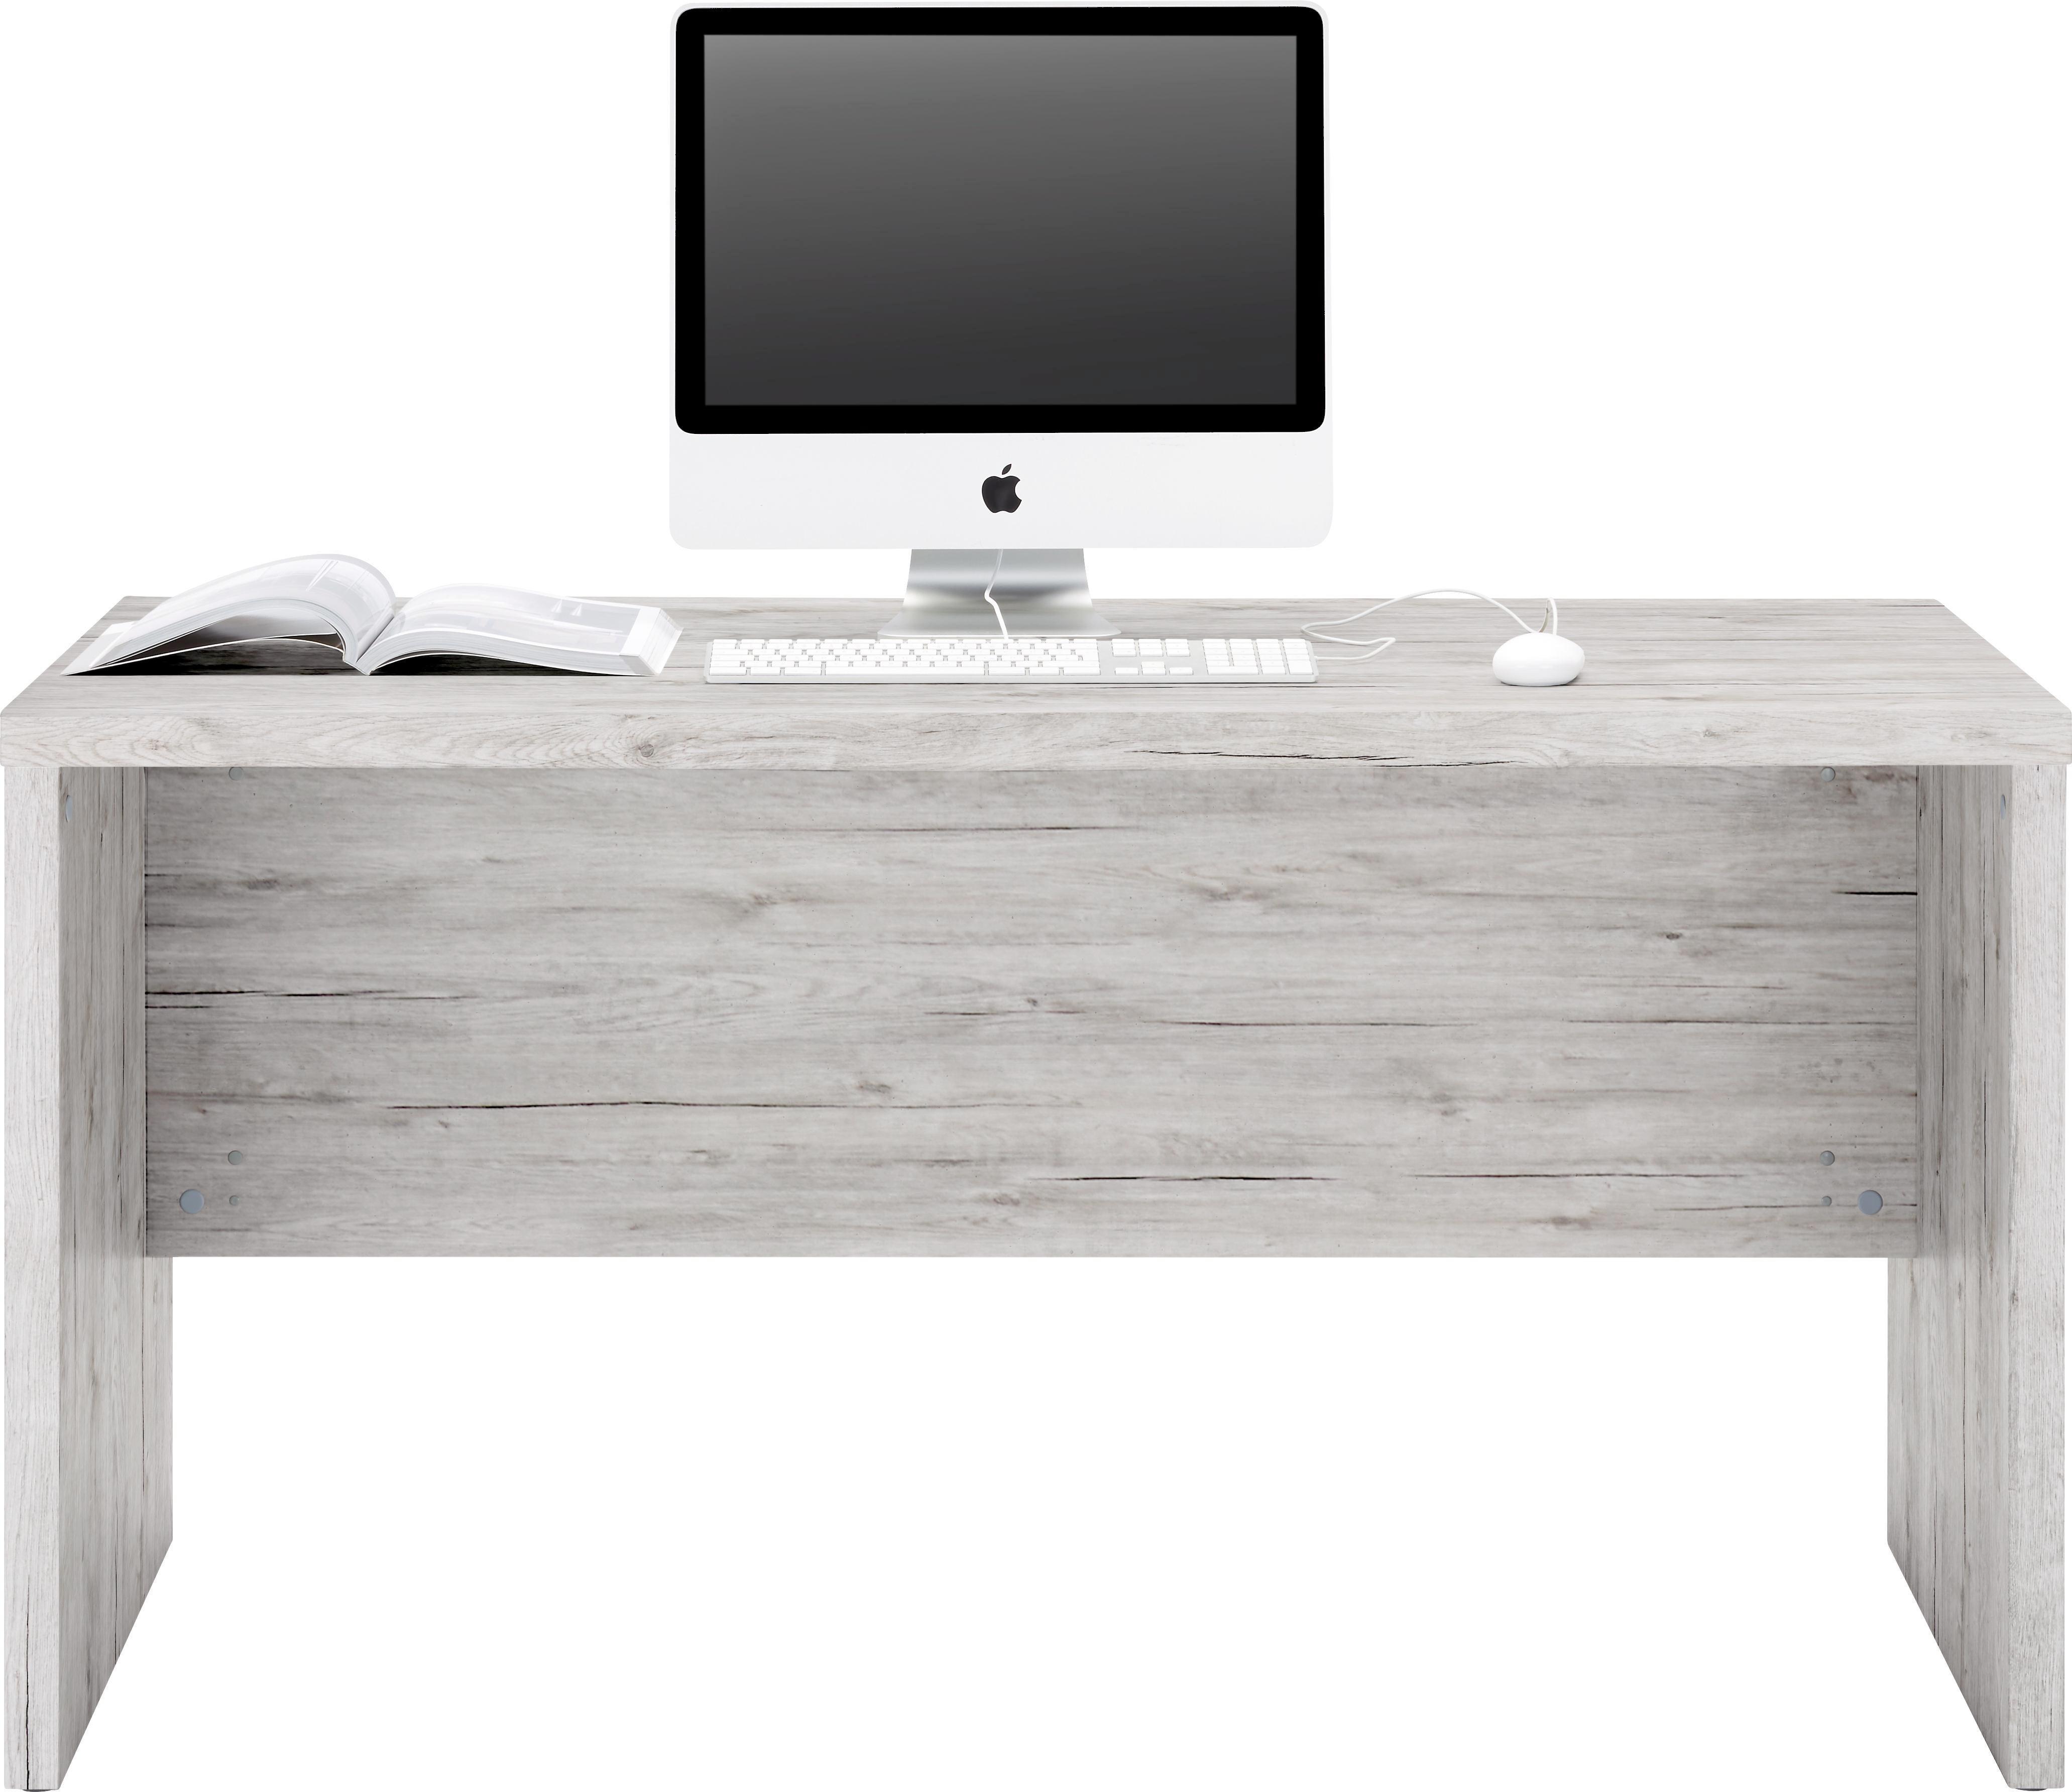 Íróasztal Schema Beton - antracit/szürke, modern, faanyagok (140/74/69cm)